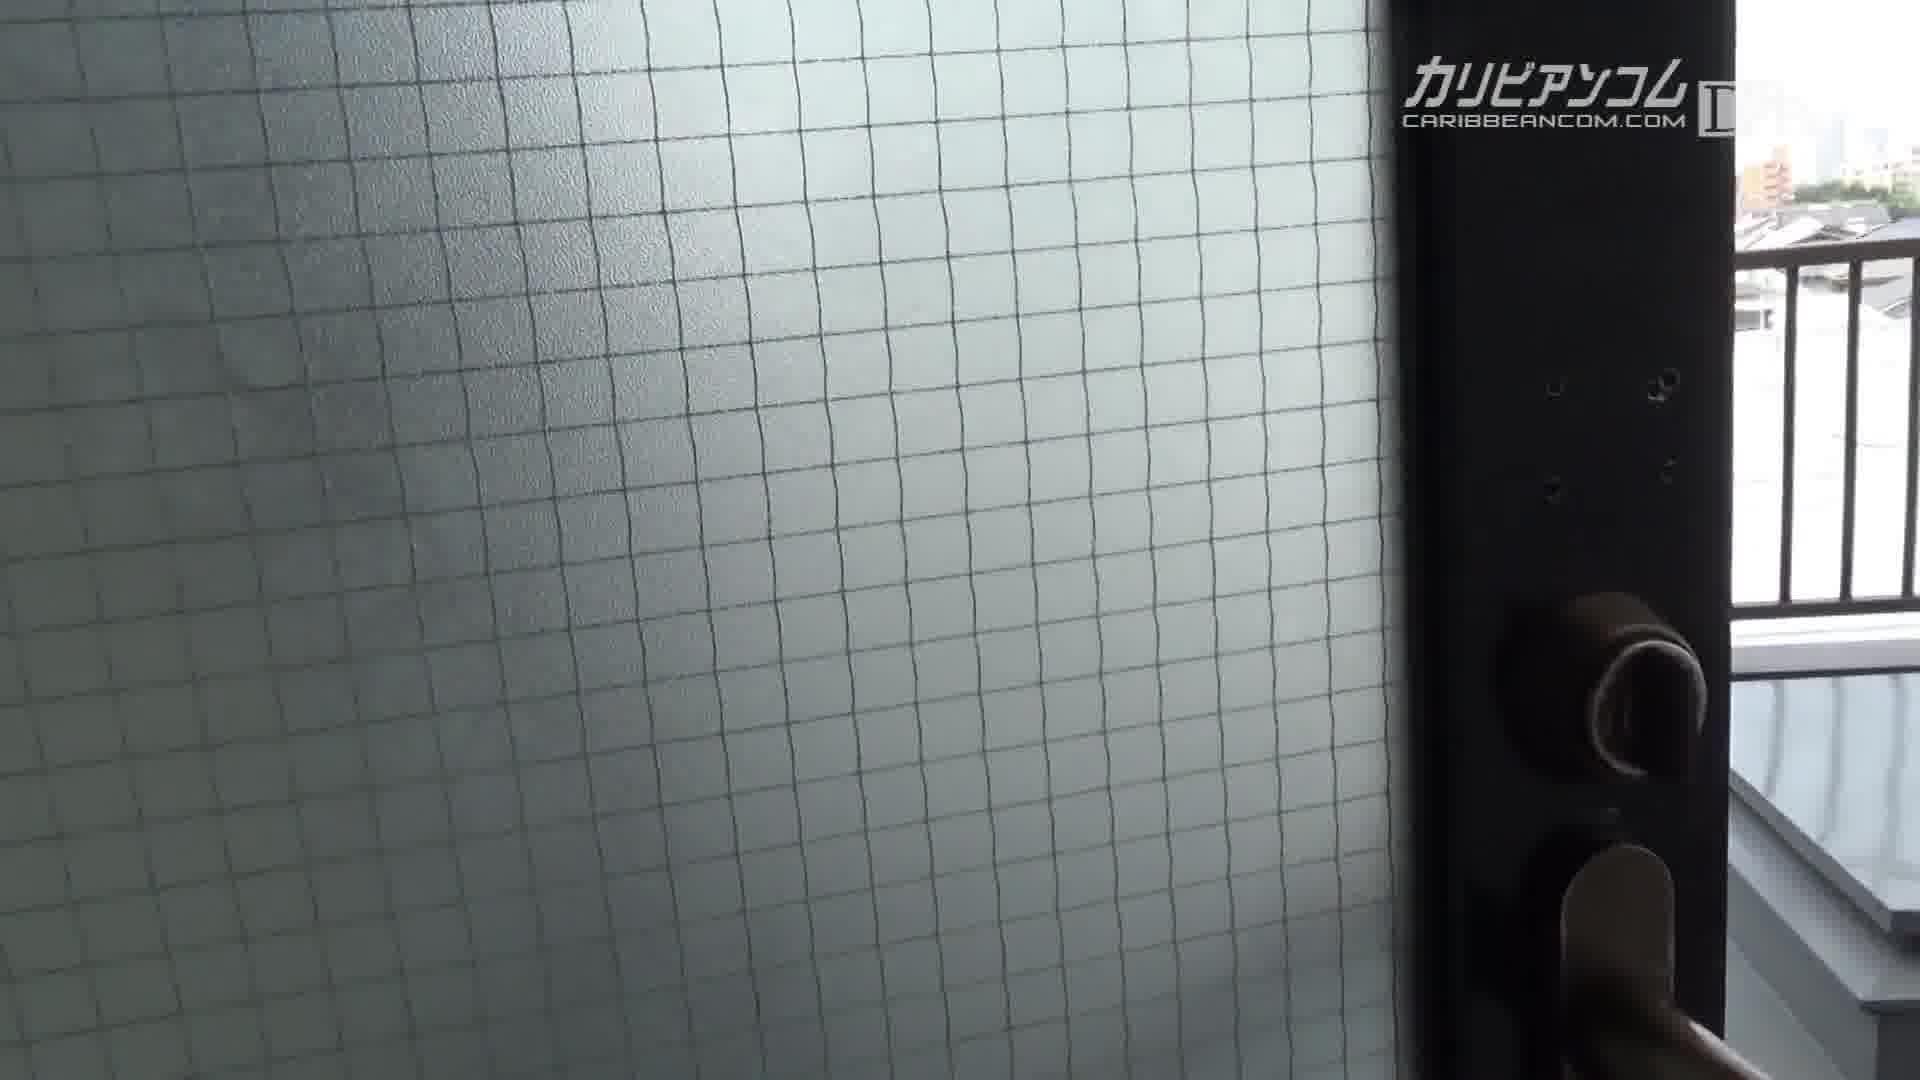 AVスタジオかくれんぼ ~見つかったら即挿入~ - 鈴原愛子【乱交・ギャル・パイパン】